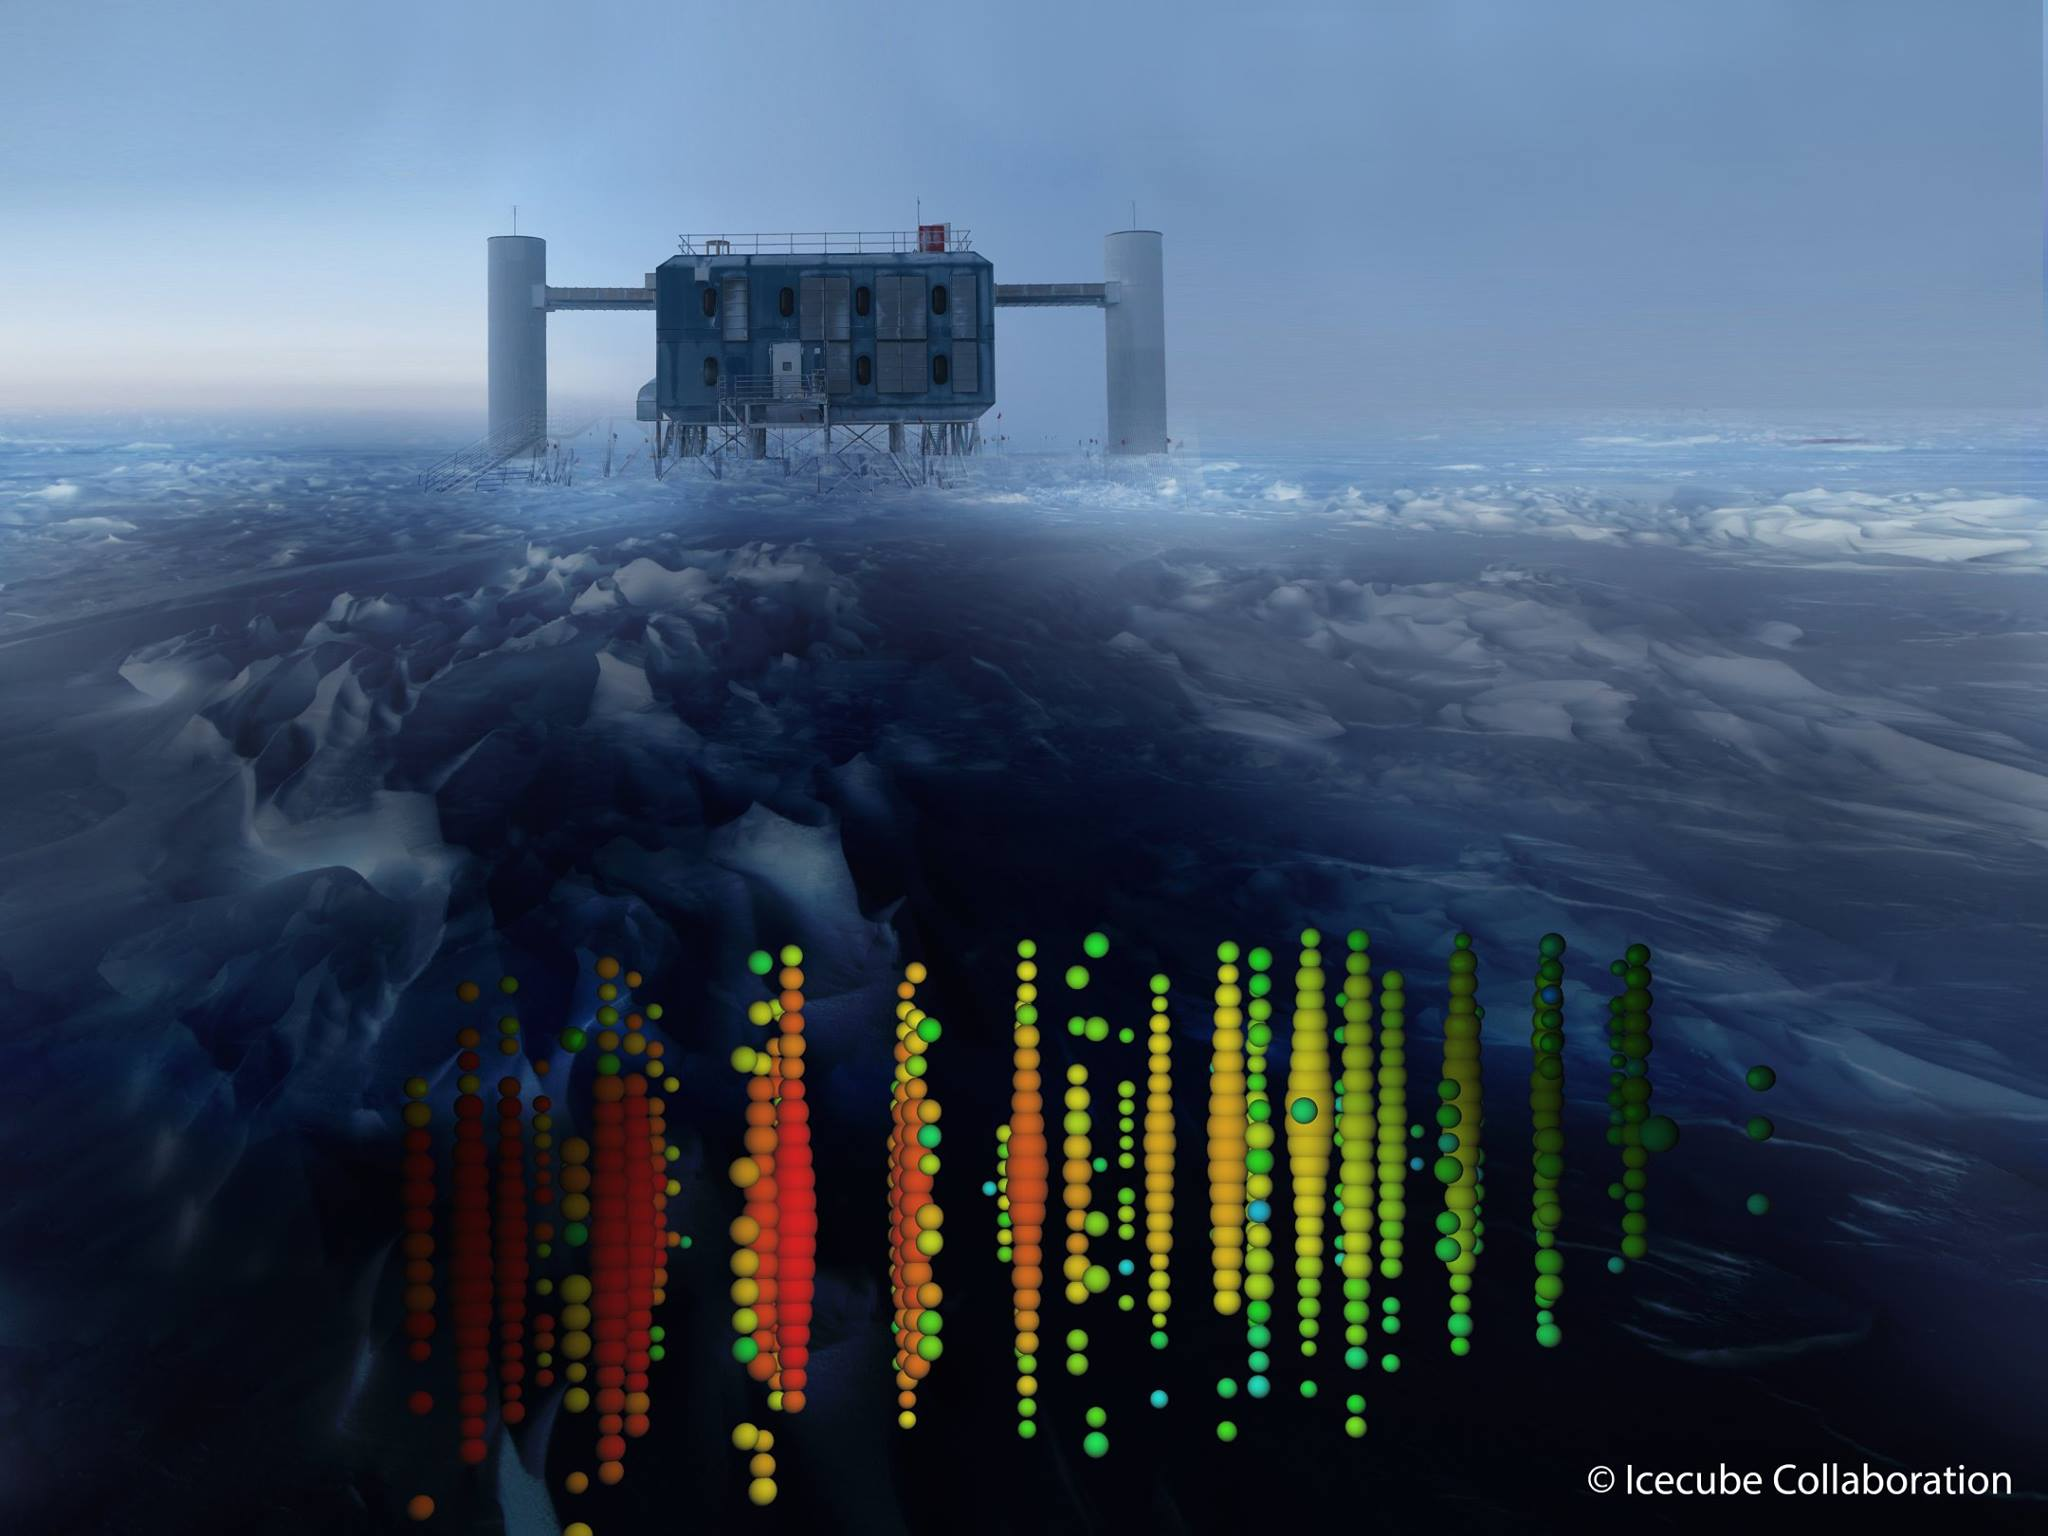 Bilddatei: IceCube(C)IceCube Collaboration.jpg